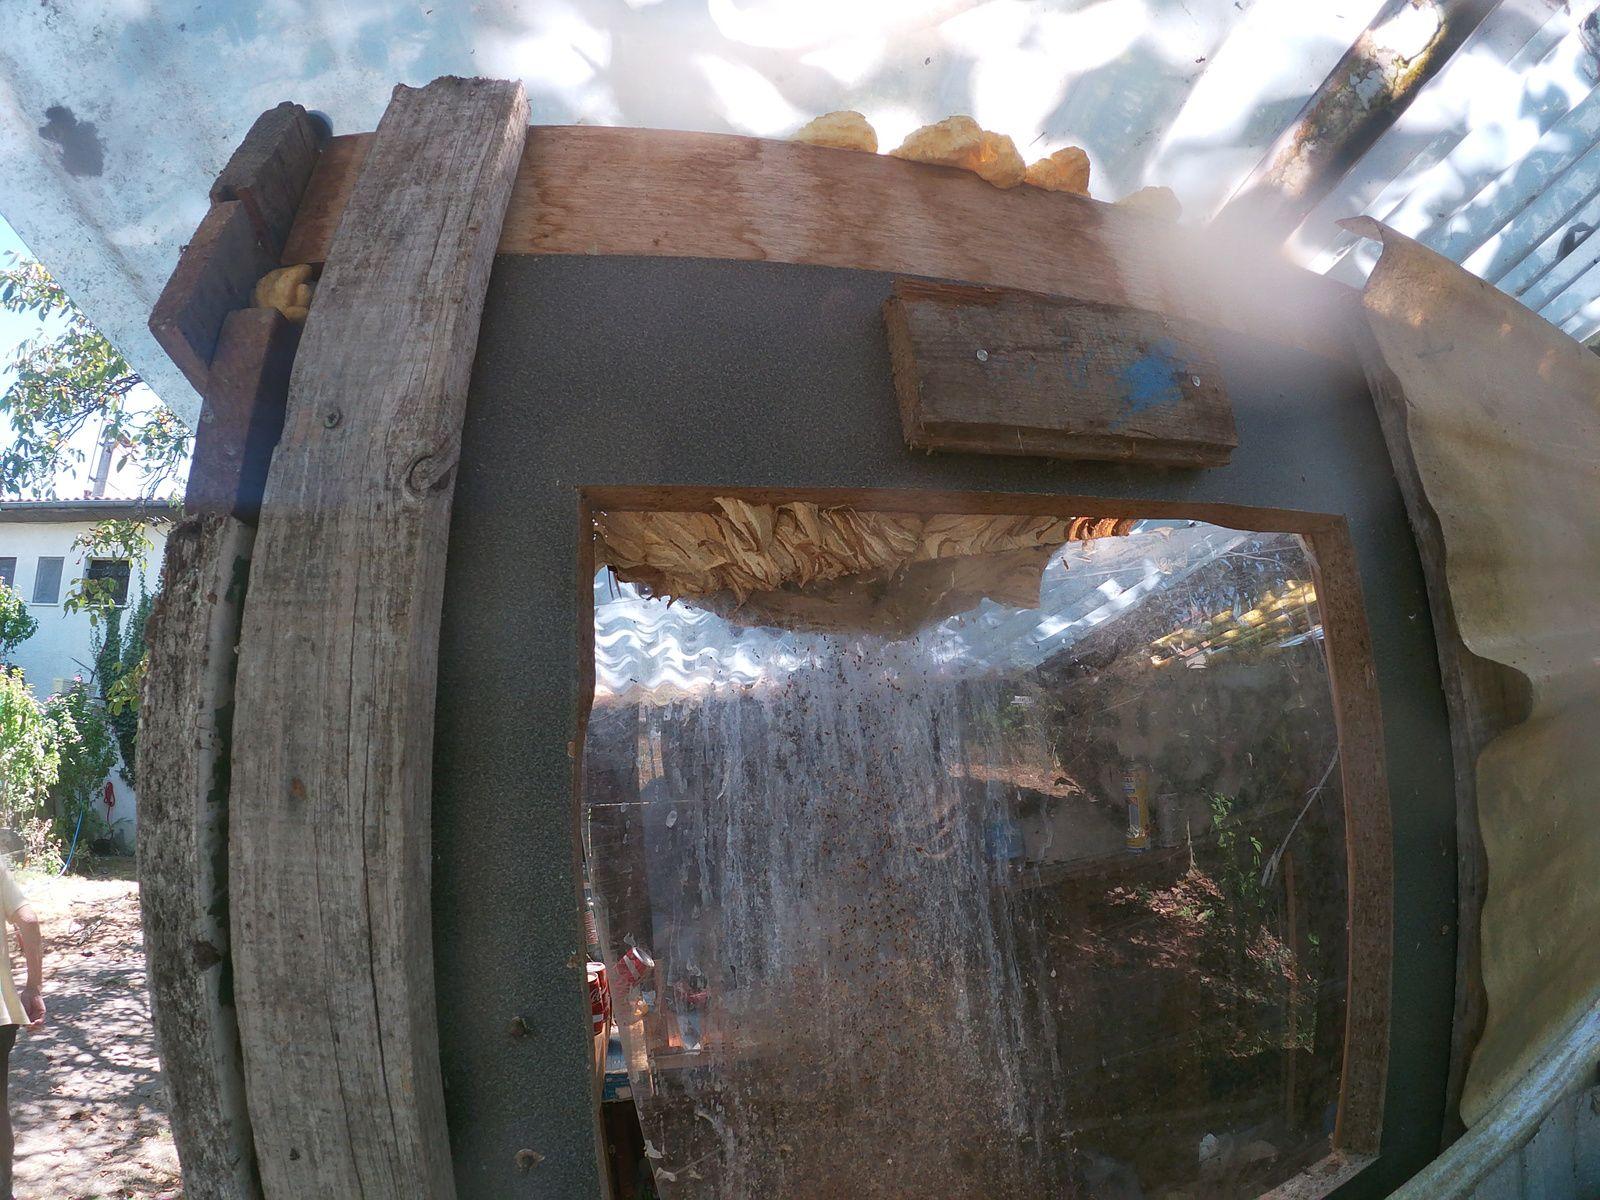 Pessac destruction rapide de vos nids de frelons contact 06 78 18 32 34   ADSA33